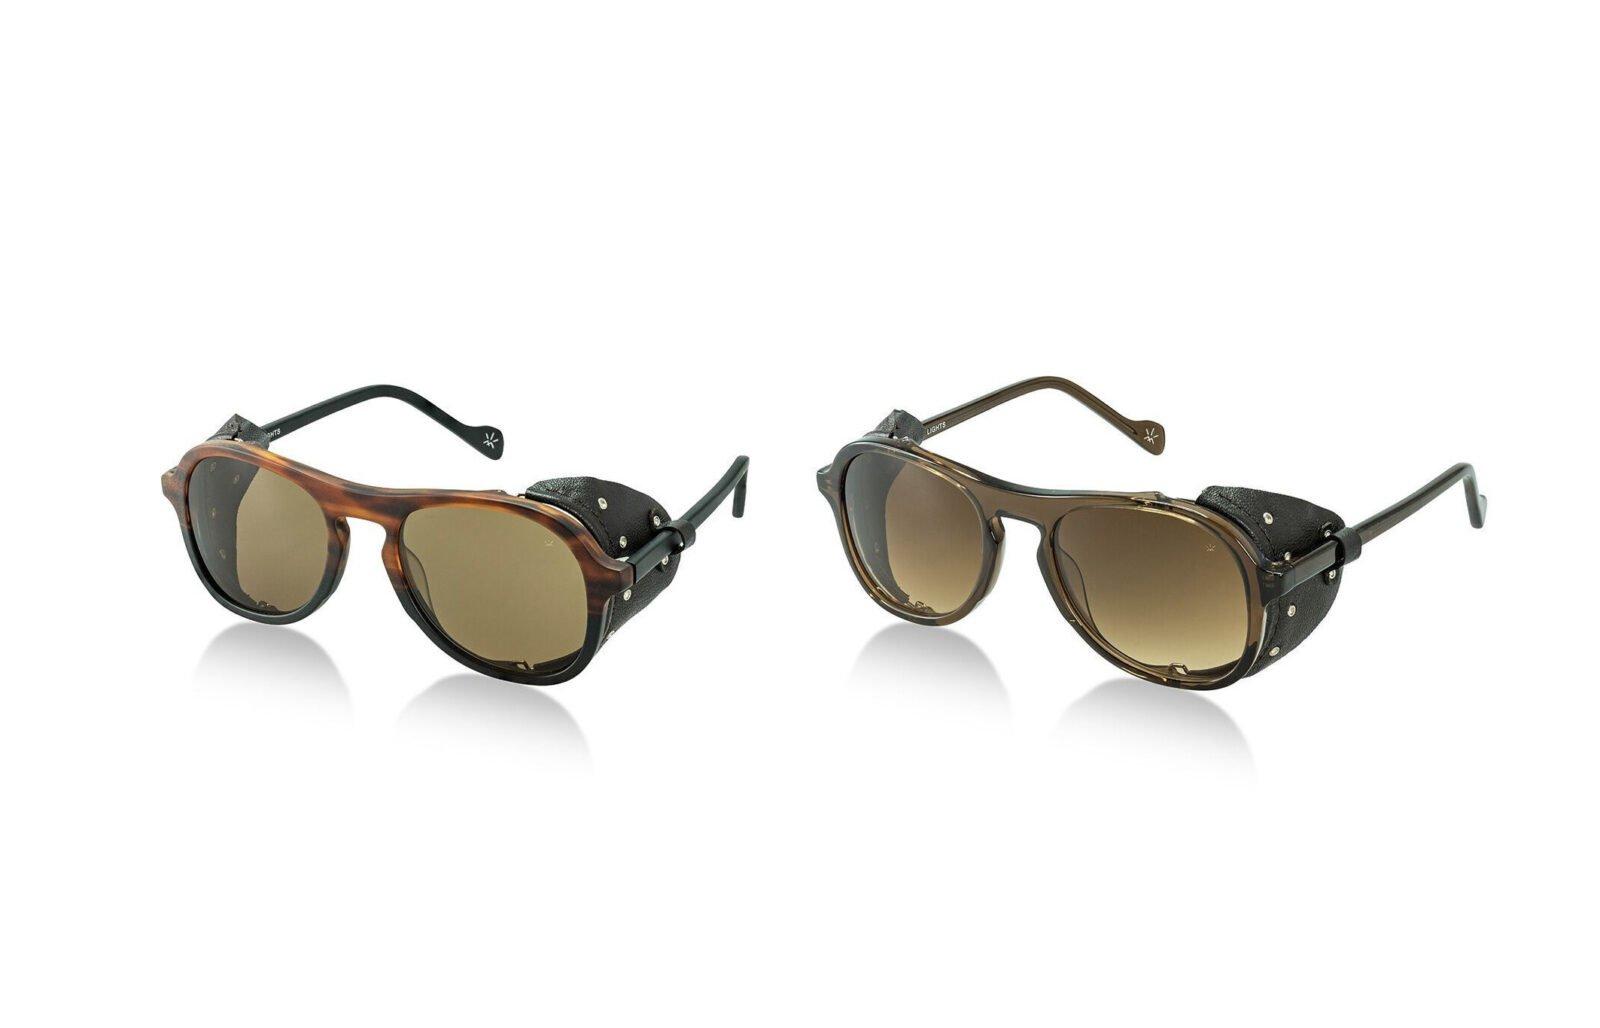 Northern Lights Optic NL 24 Sunglasses Brown Main 1600x1028 - Northern Lights Optic NL 24 Sunglasses